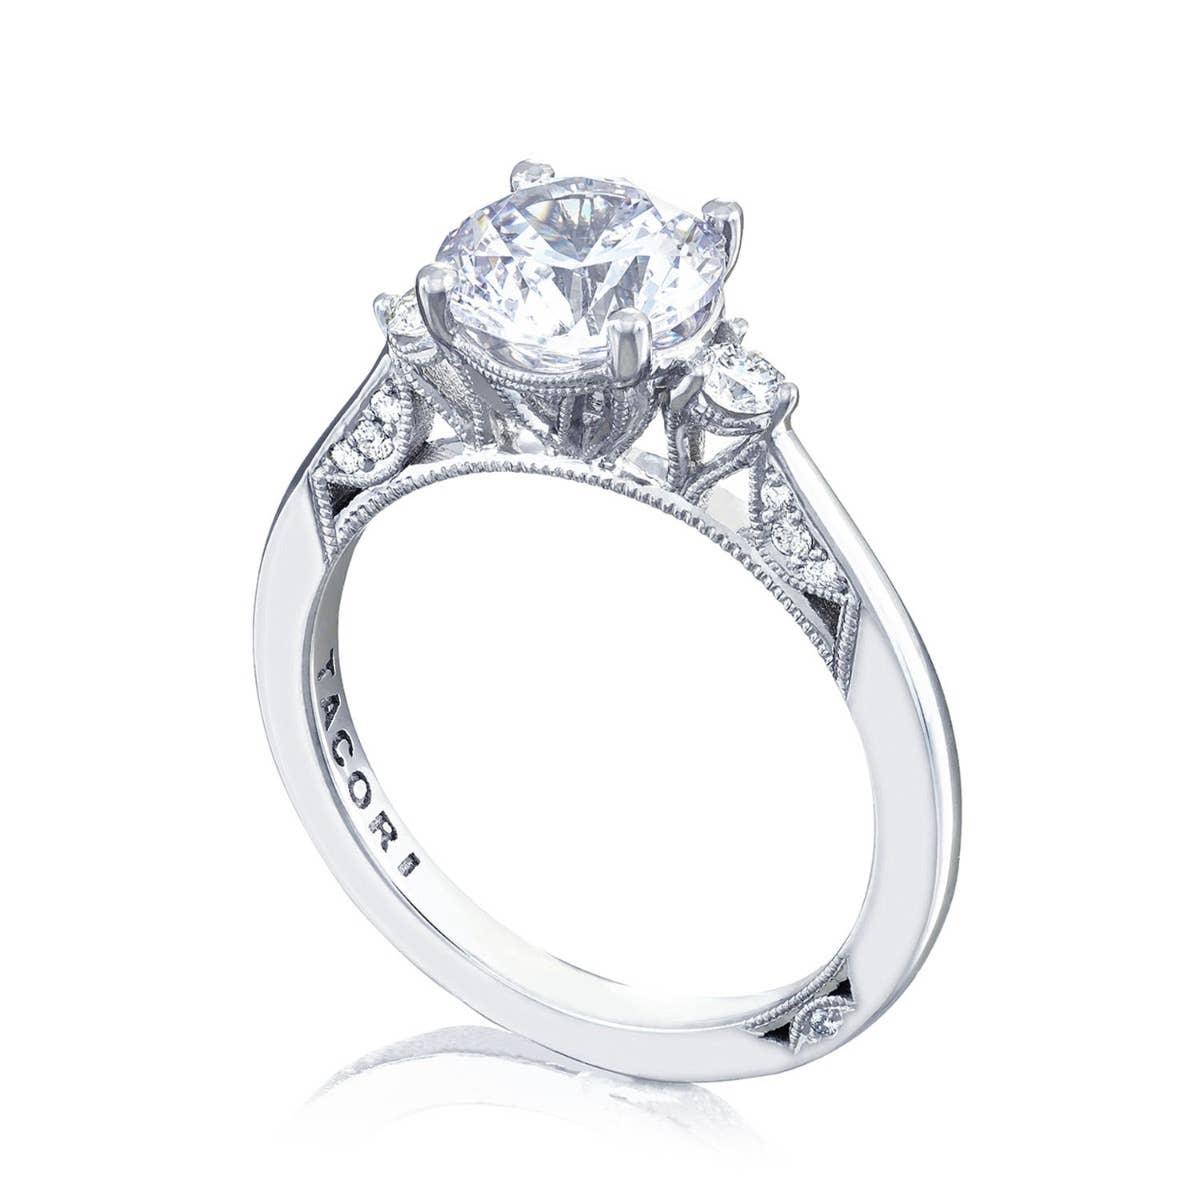 Tacori Engagement Rings - 2656rd